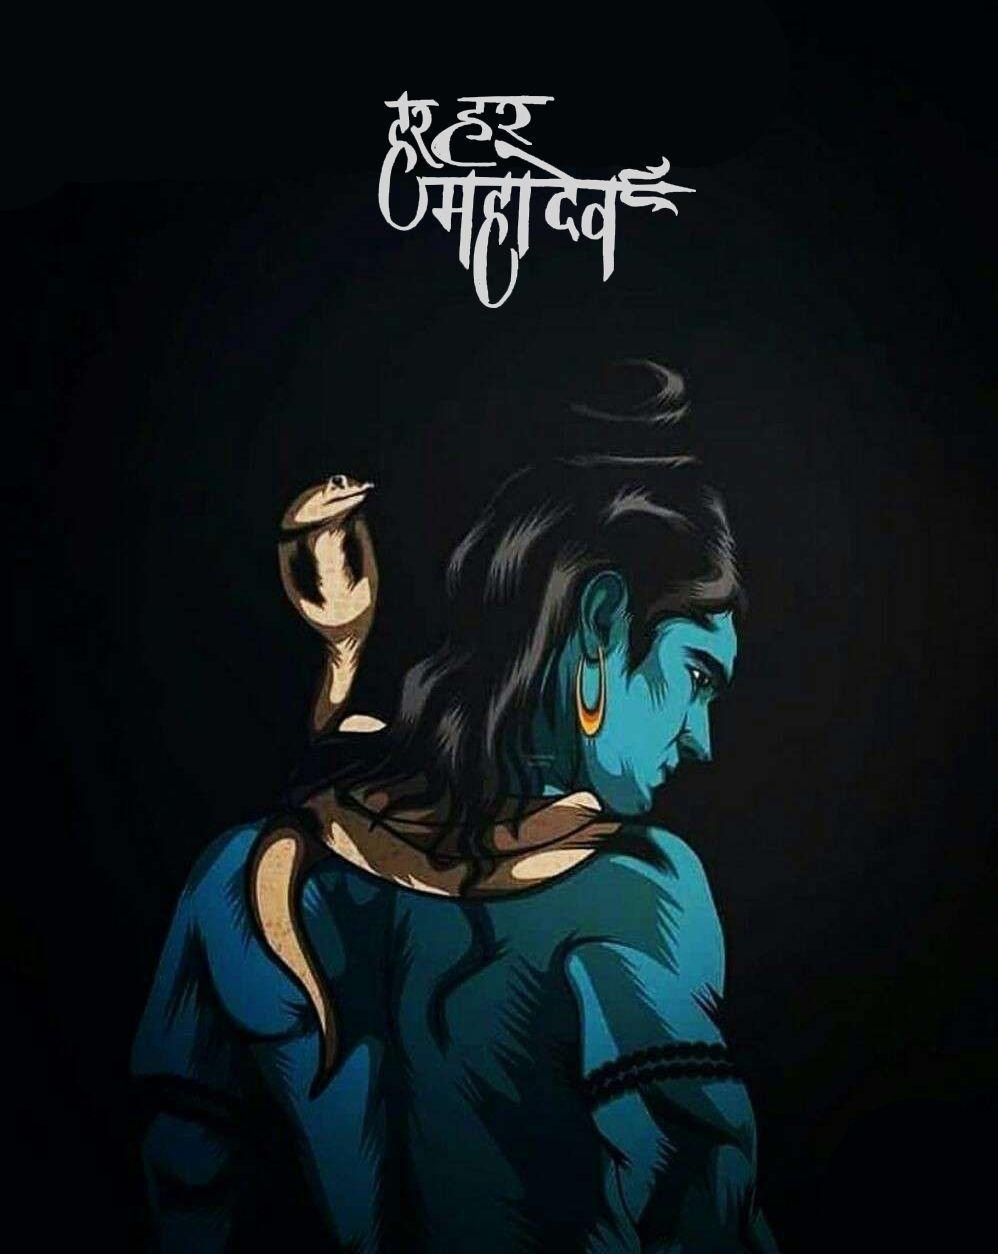 Iphone Lord Shiva Mahakal Wallpapers Wallpaper Cave